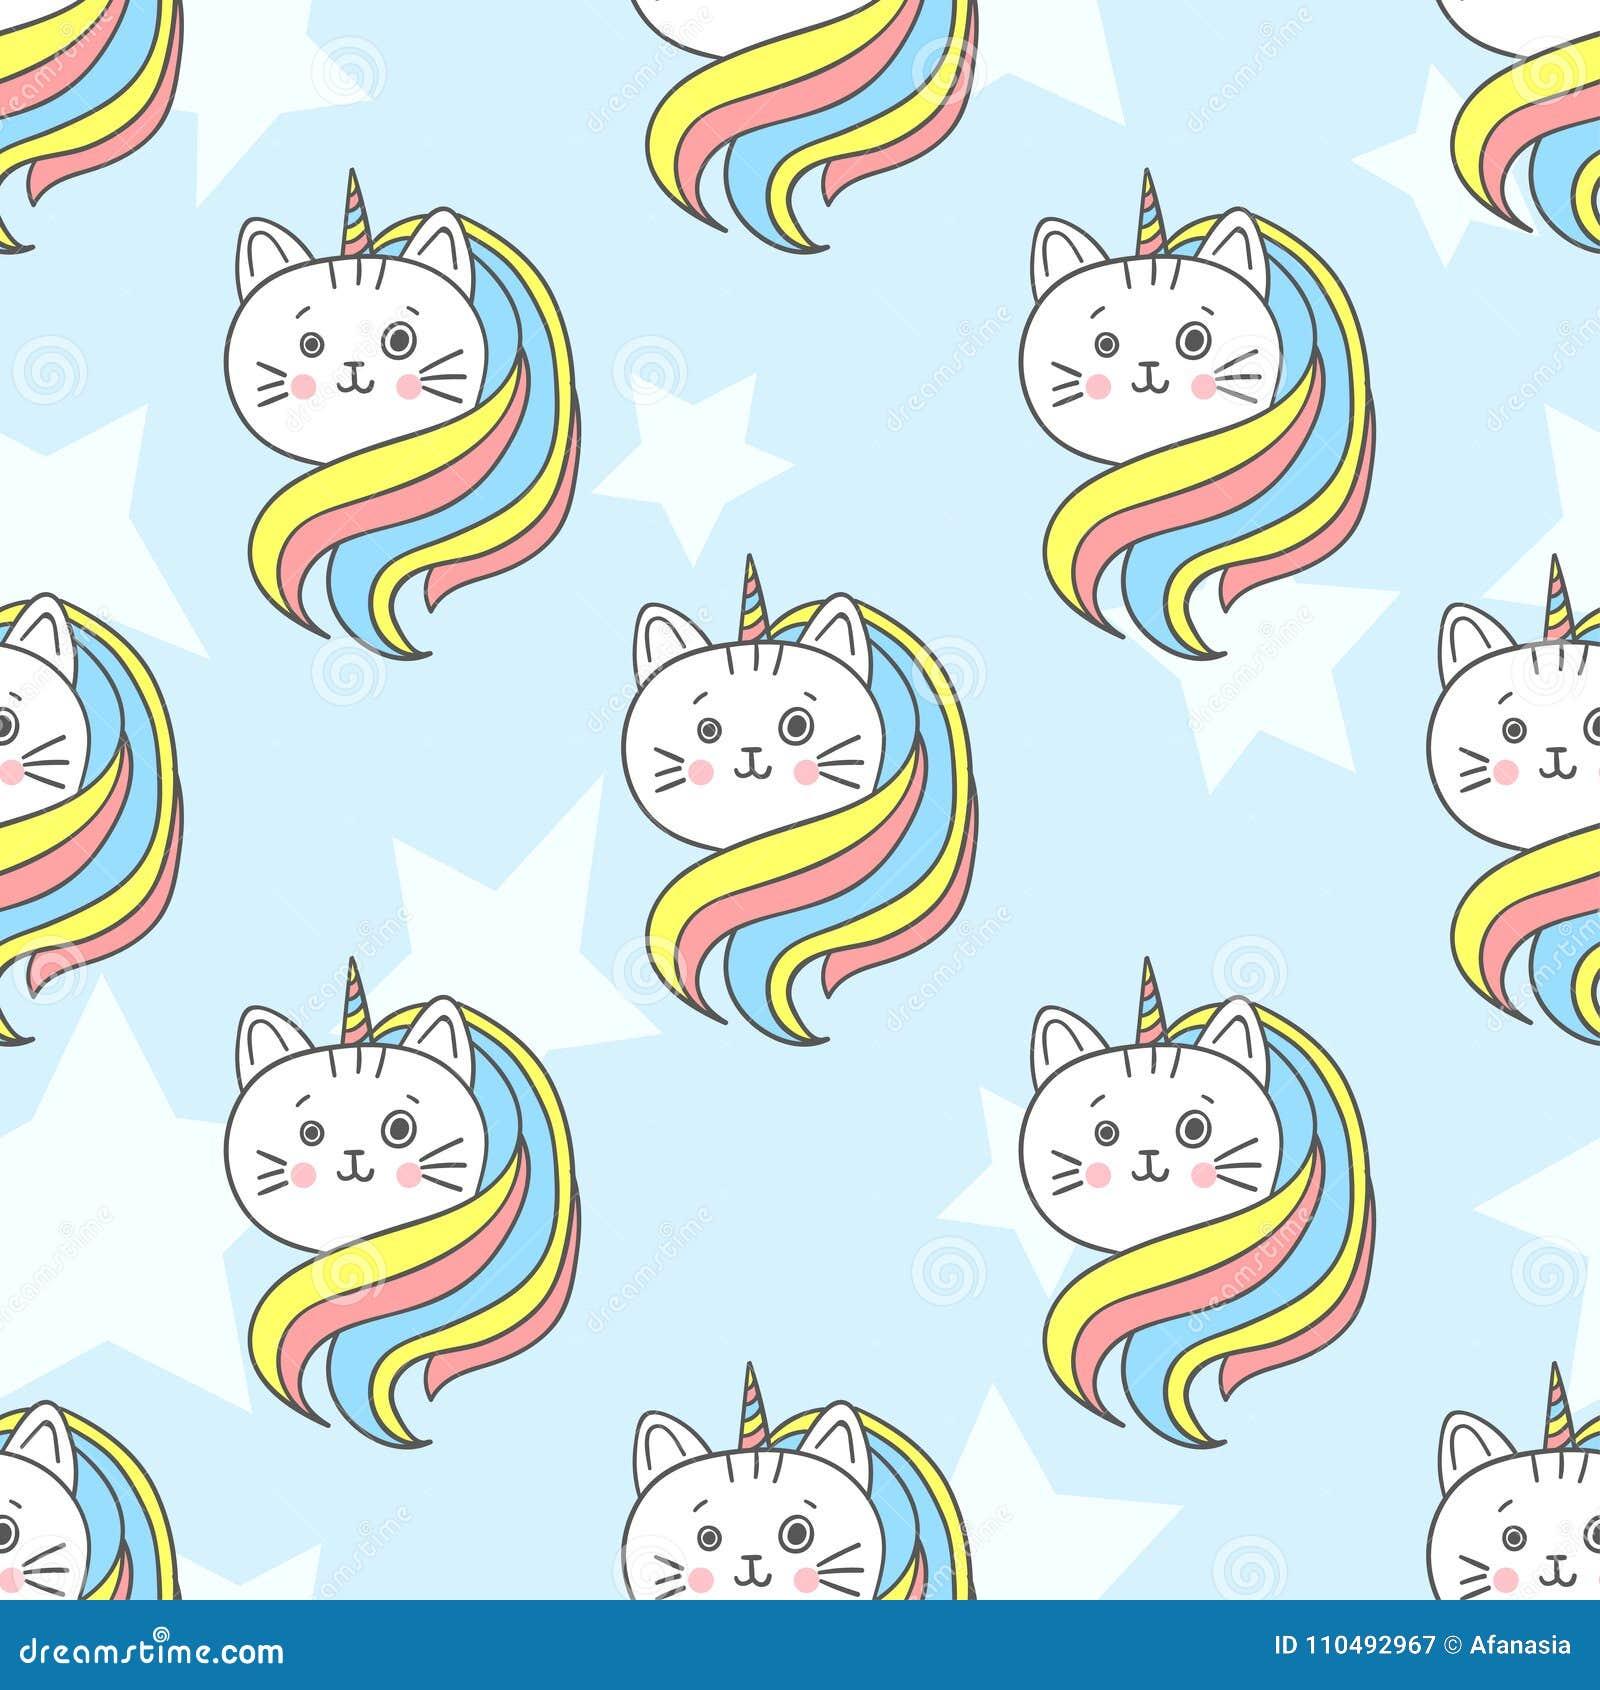 Cute Rainbow Cat Unicorn Seamless Pattern Stock Vector